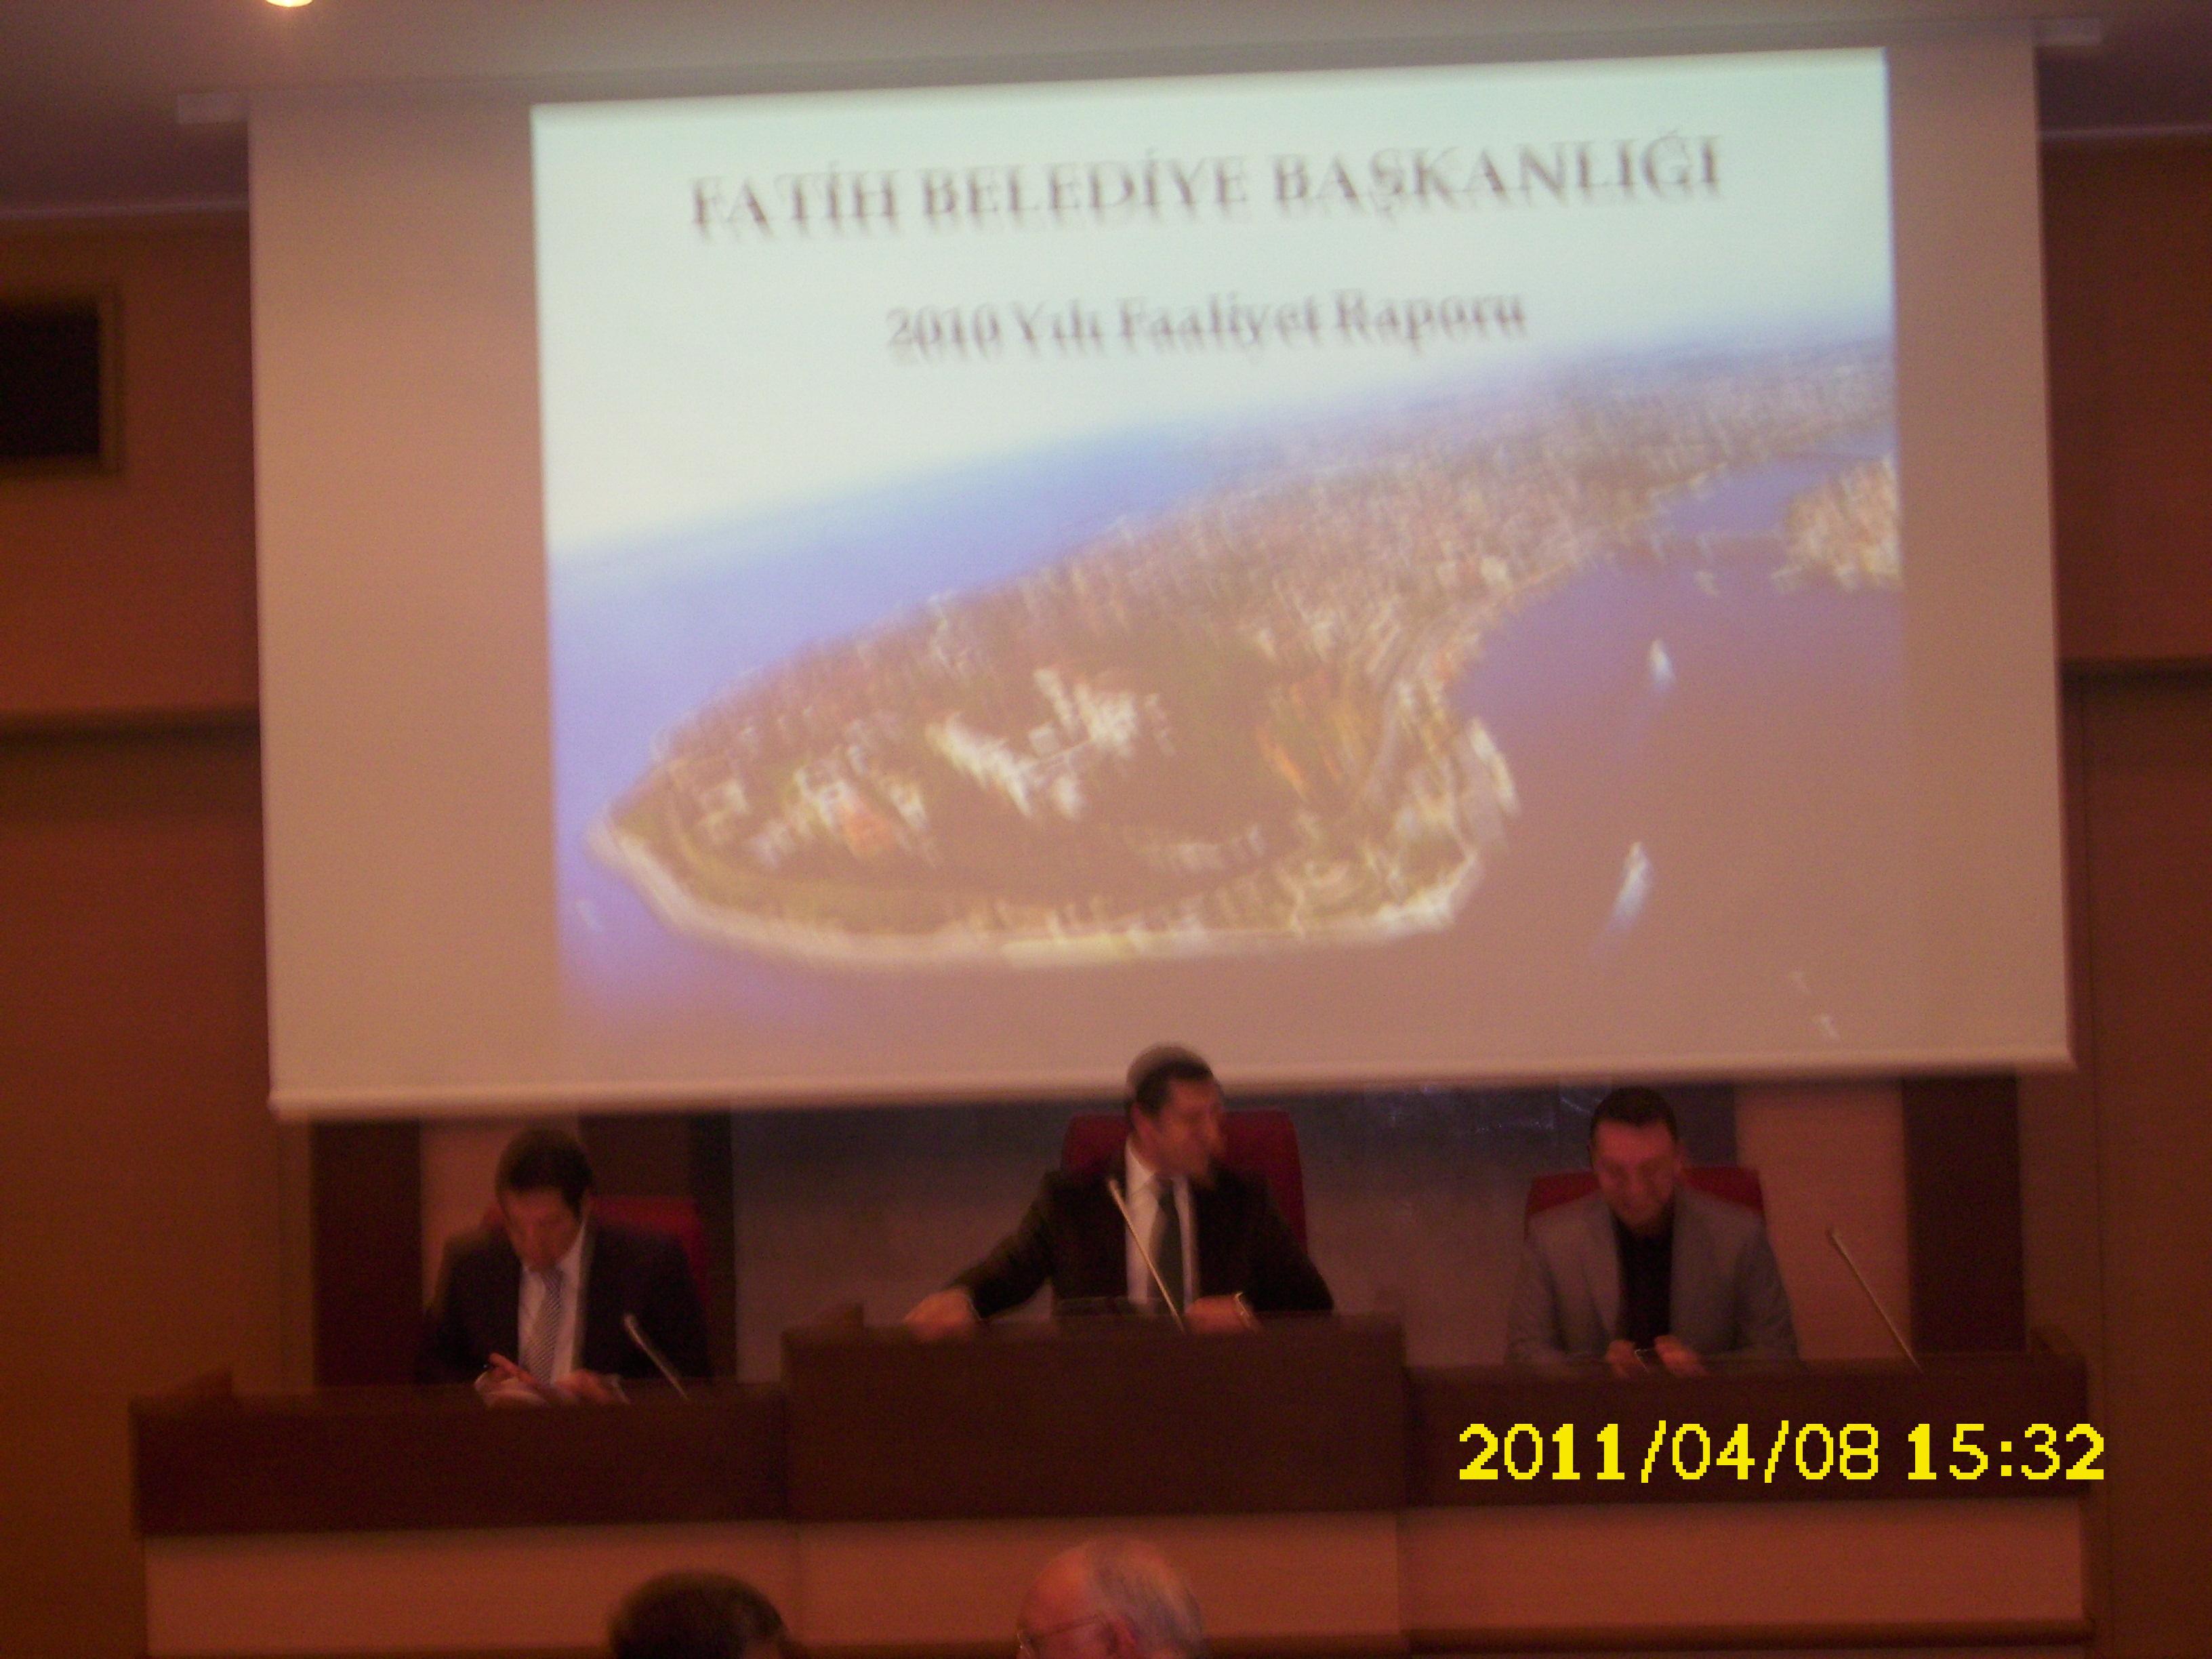 Fatih Belediye Meclisi 2010 Faaliyet Raporu Gündemli